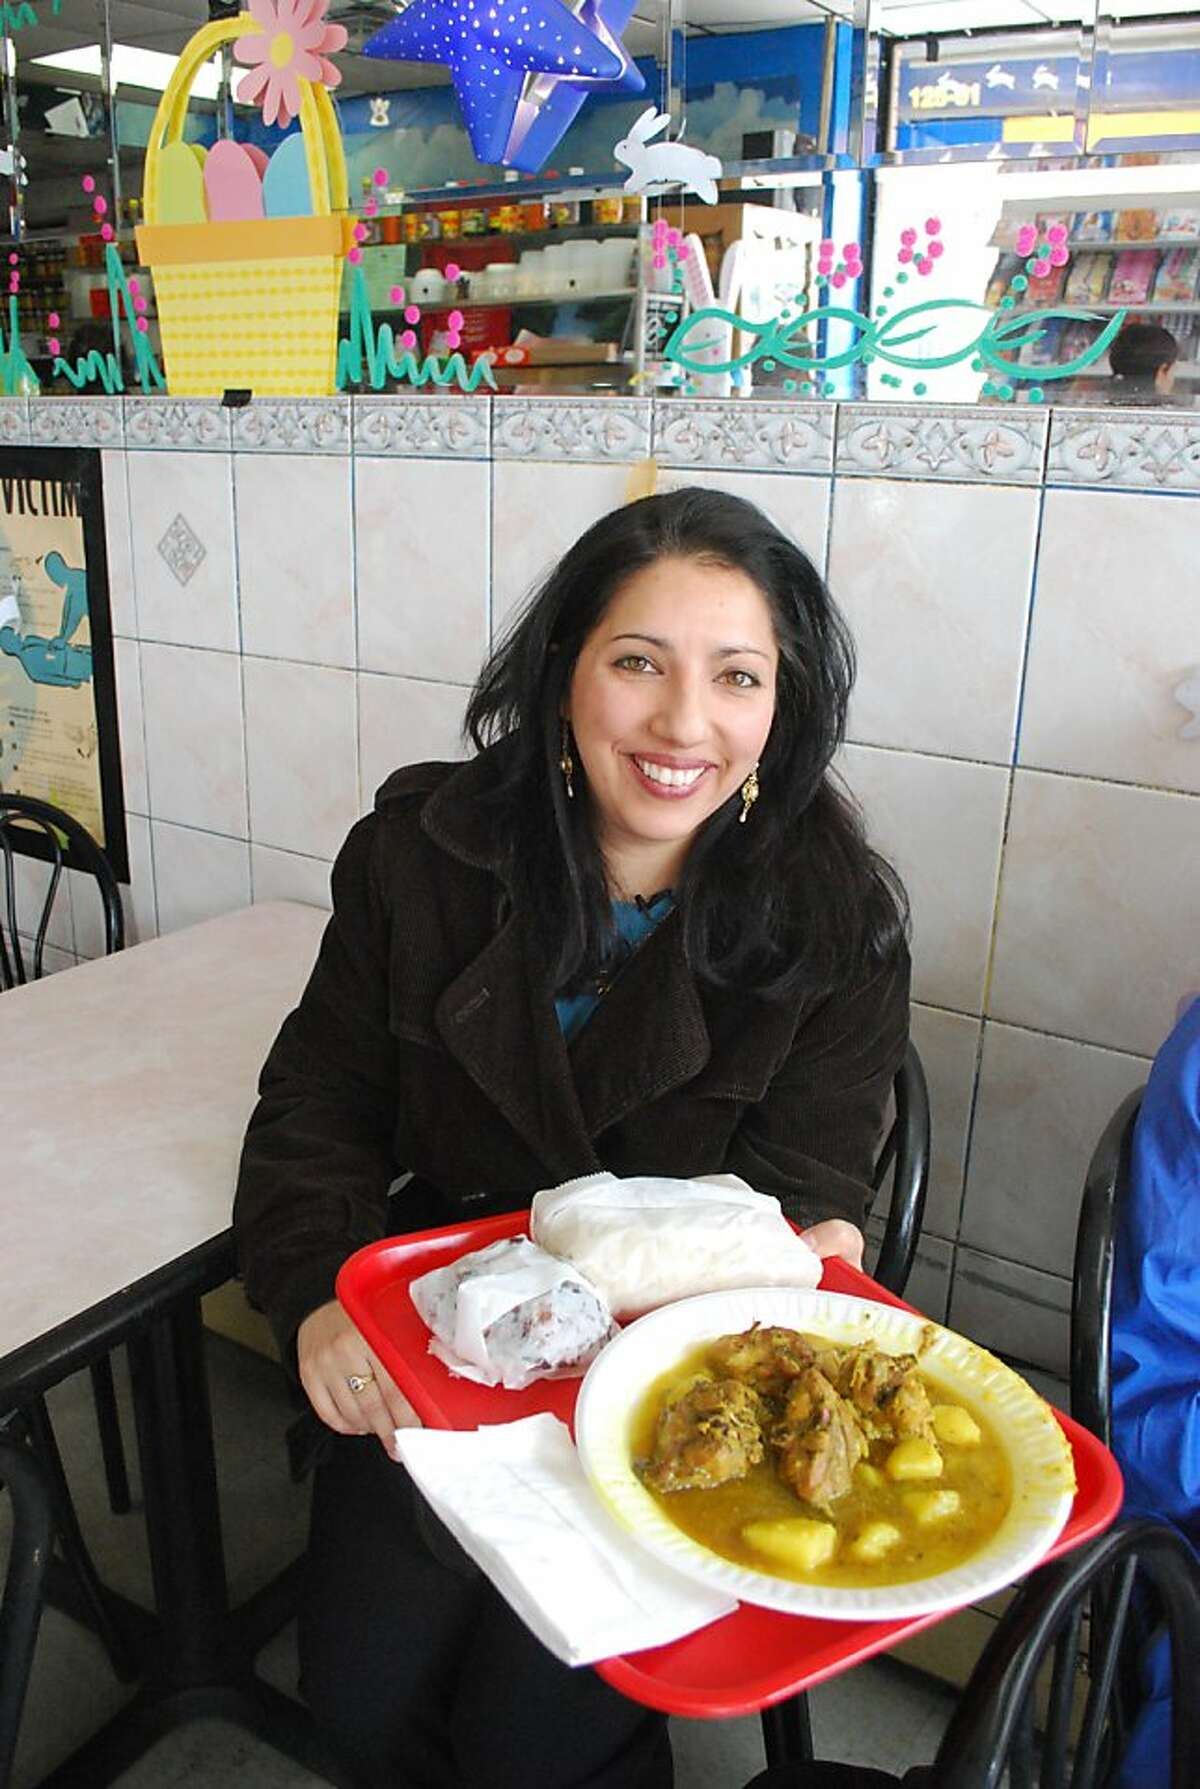 Ramin Ganeshram, foodie, chef and author of